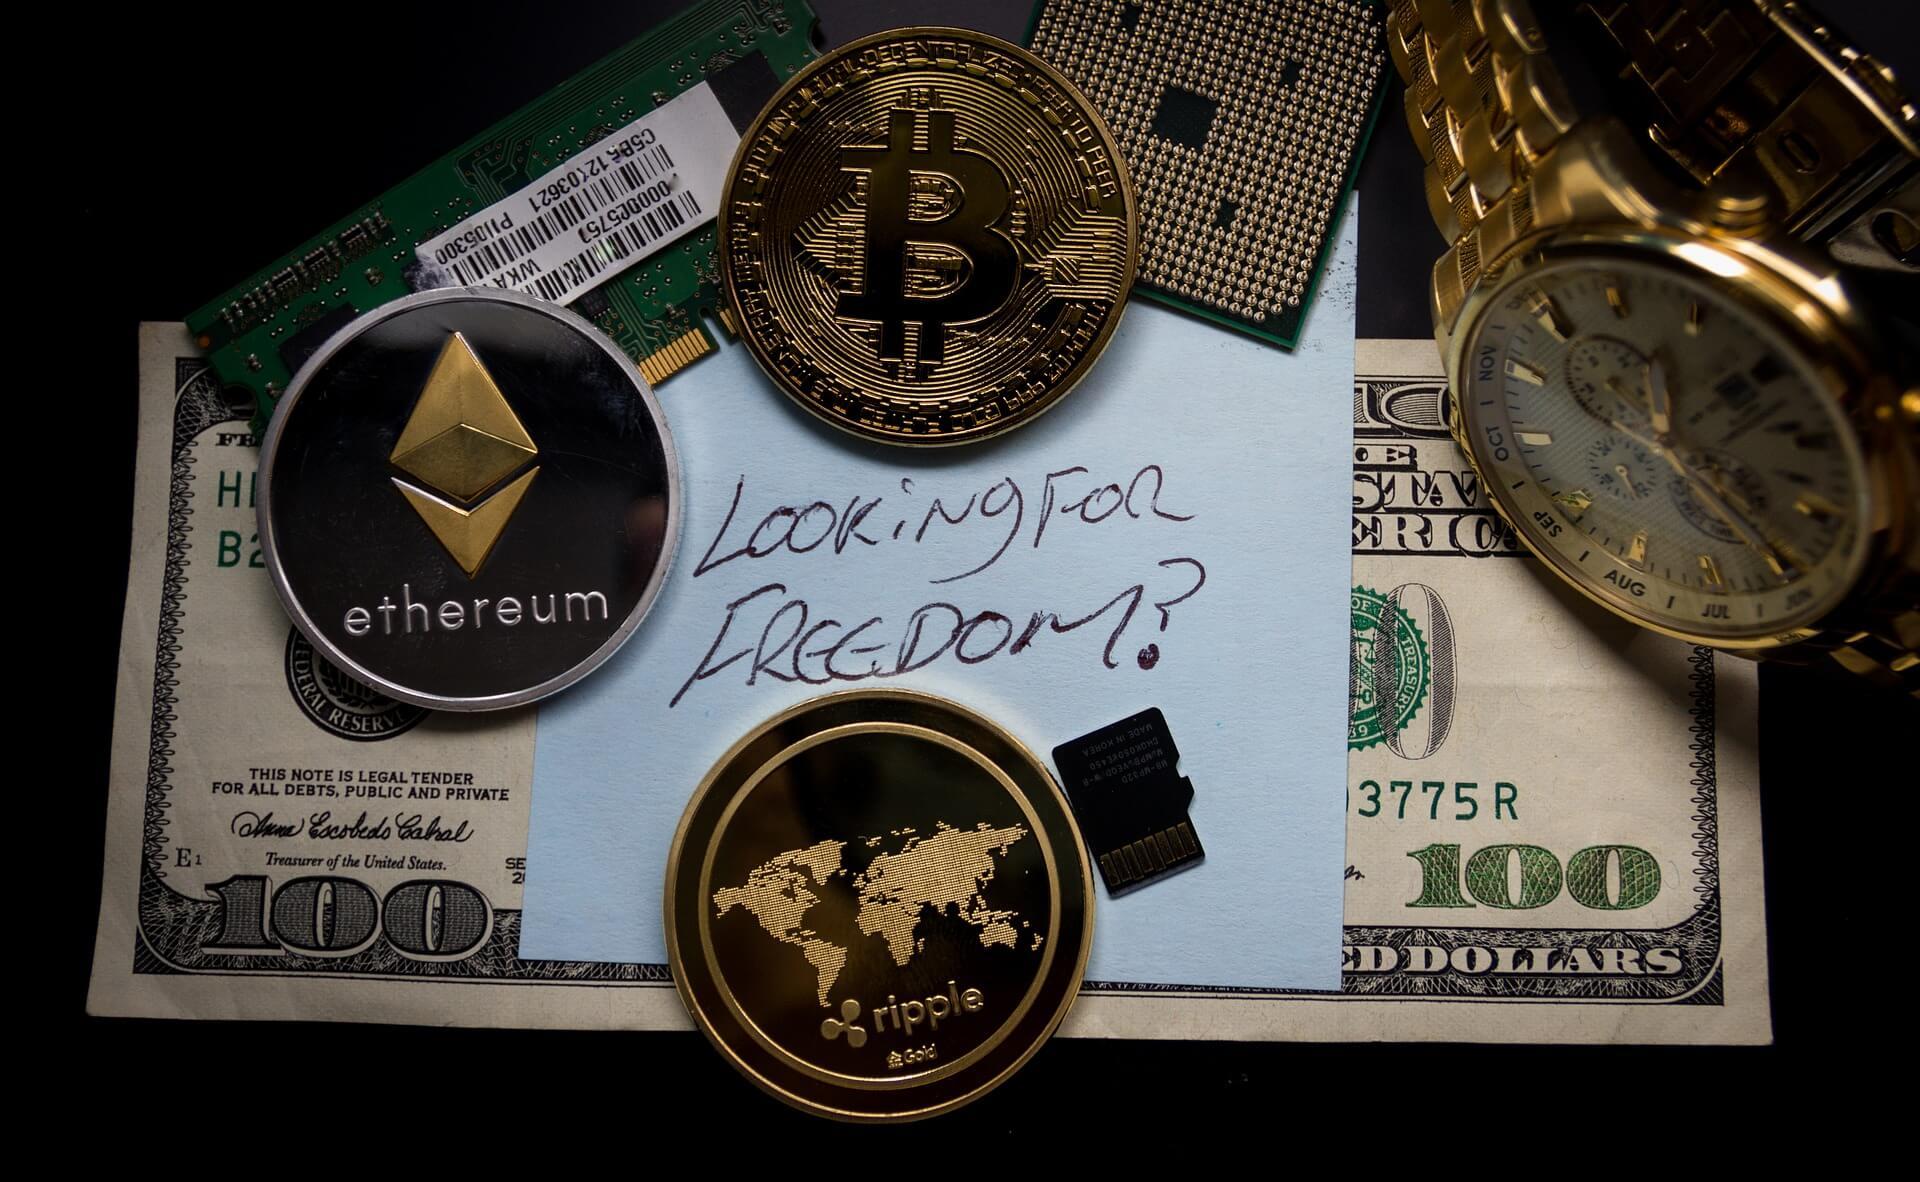 Virtual Currencies: Bitcoin weakened, others grow